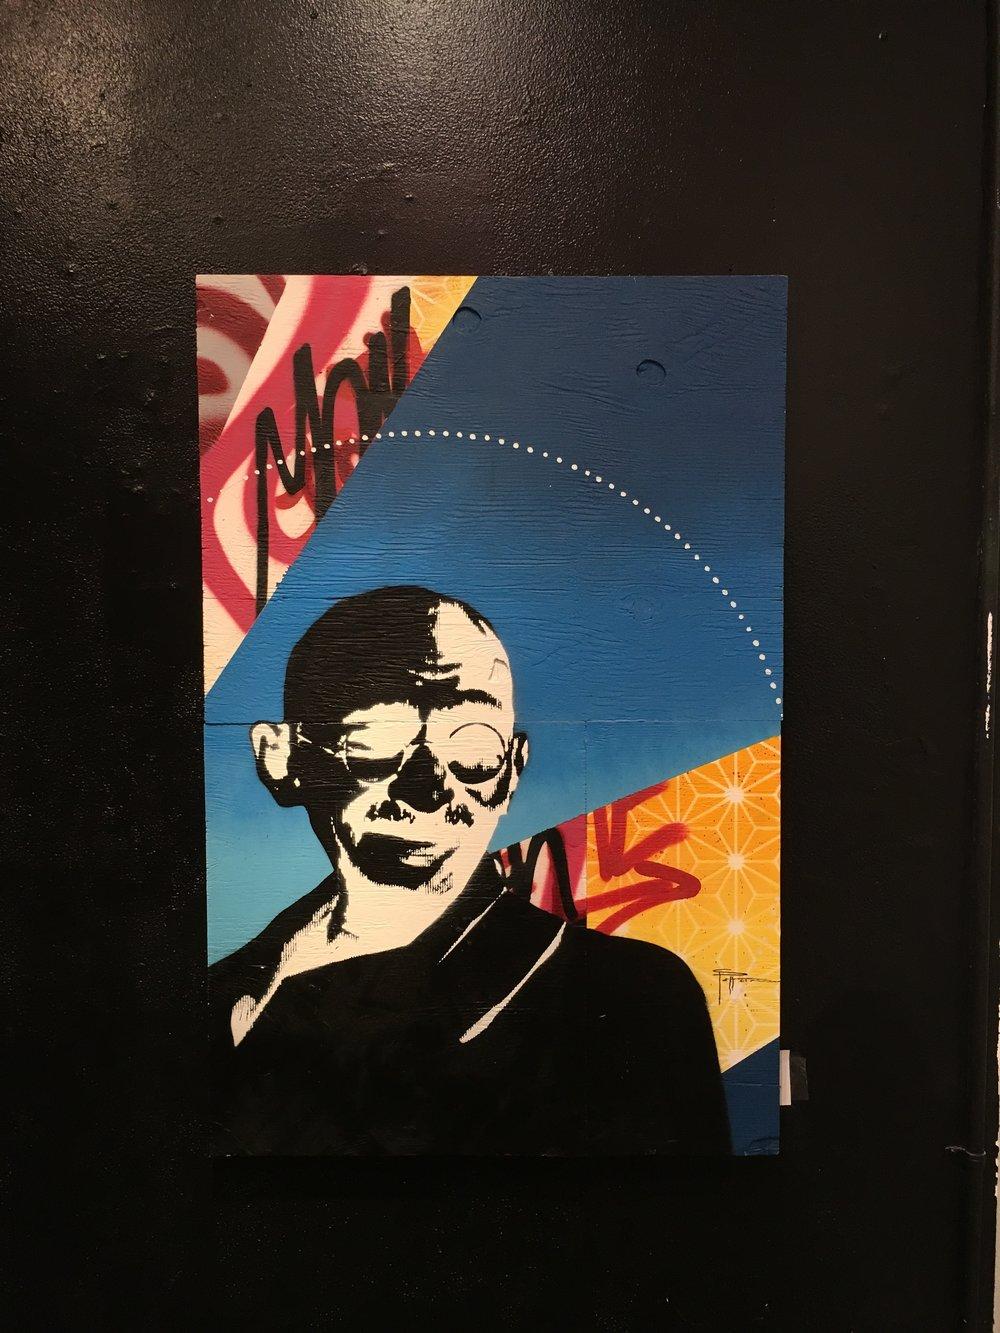 Strider Patton - Mahatma Gandhi- Idols show - San Francisco, CA 2016